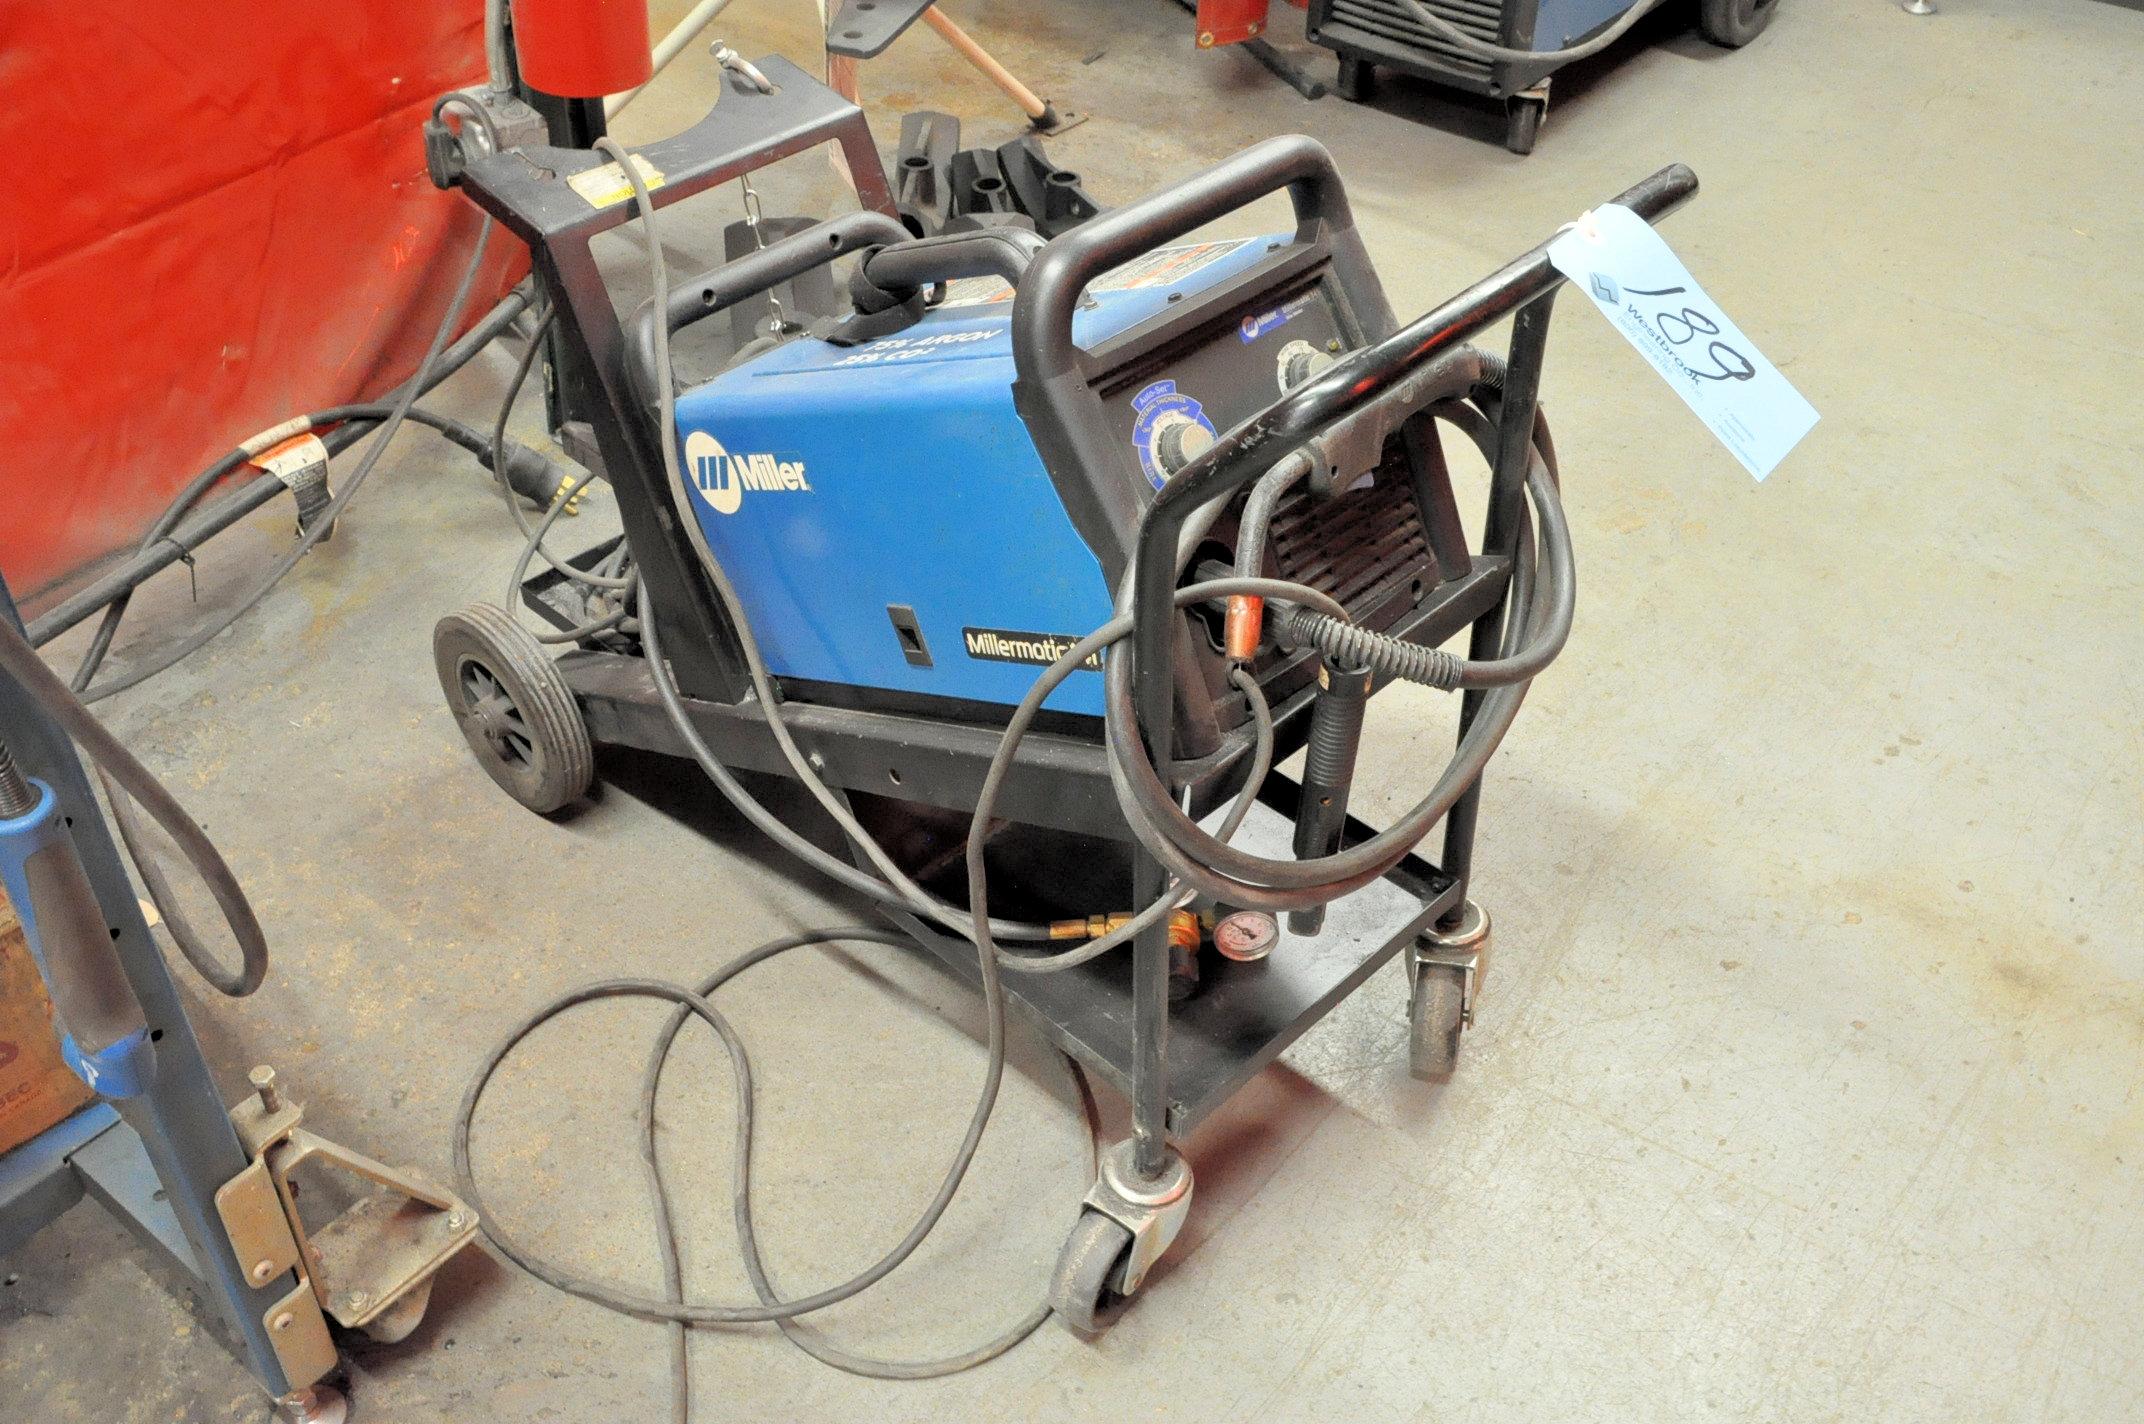 Miller Millermatic 141, 90-Amp Capacity Wire Feed Mig Welder, - Image 2 of 2